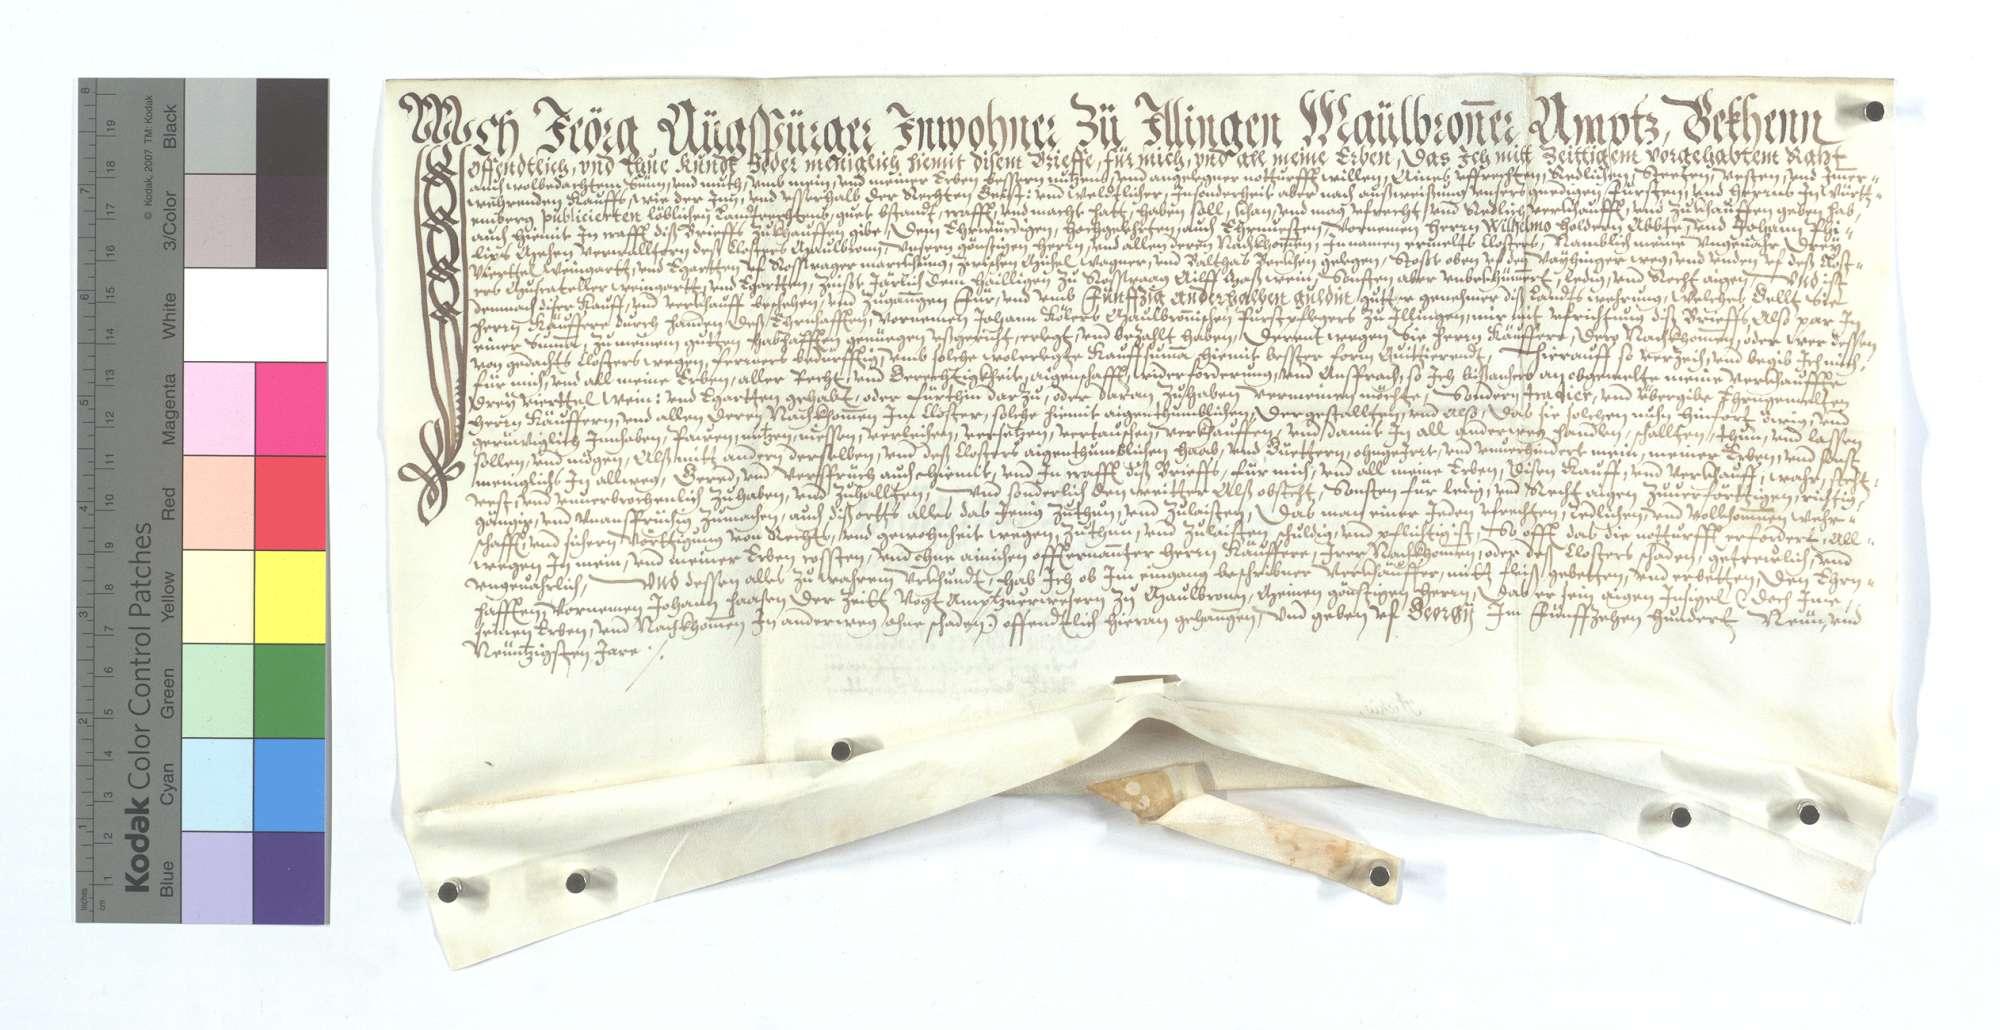 Jörg Augsburger (Augspurger) von Illingen verkauft dem Kloster Maulbronn 3 Quadratruten (Viertel) Weingarten und Eggerten (Egerten) auf Roßwager Markung., Text